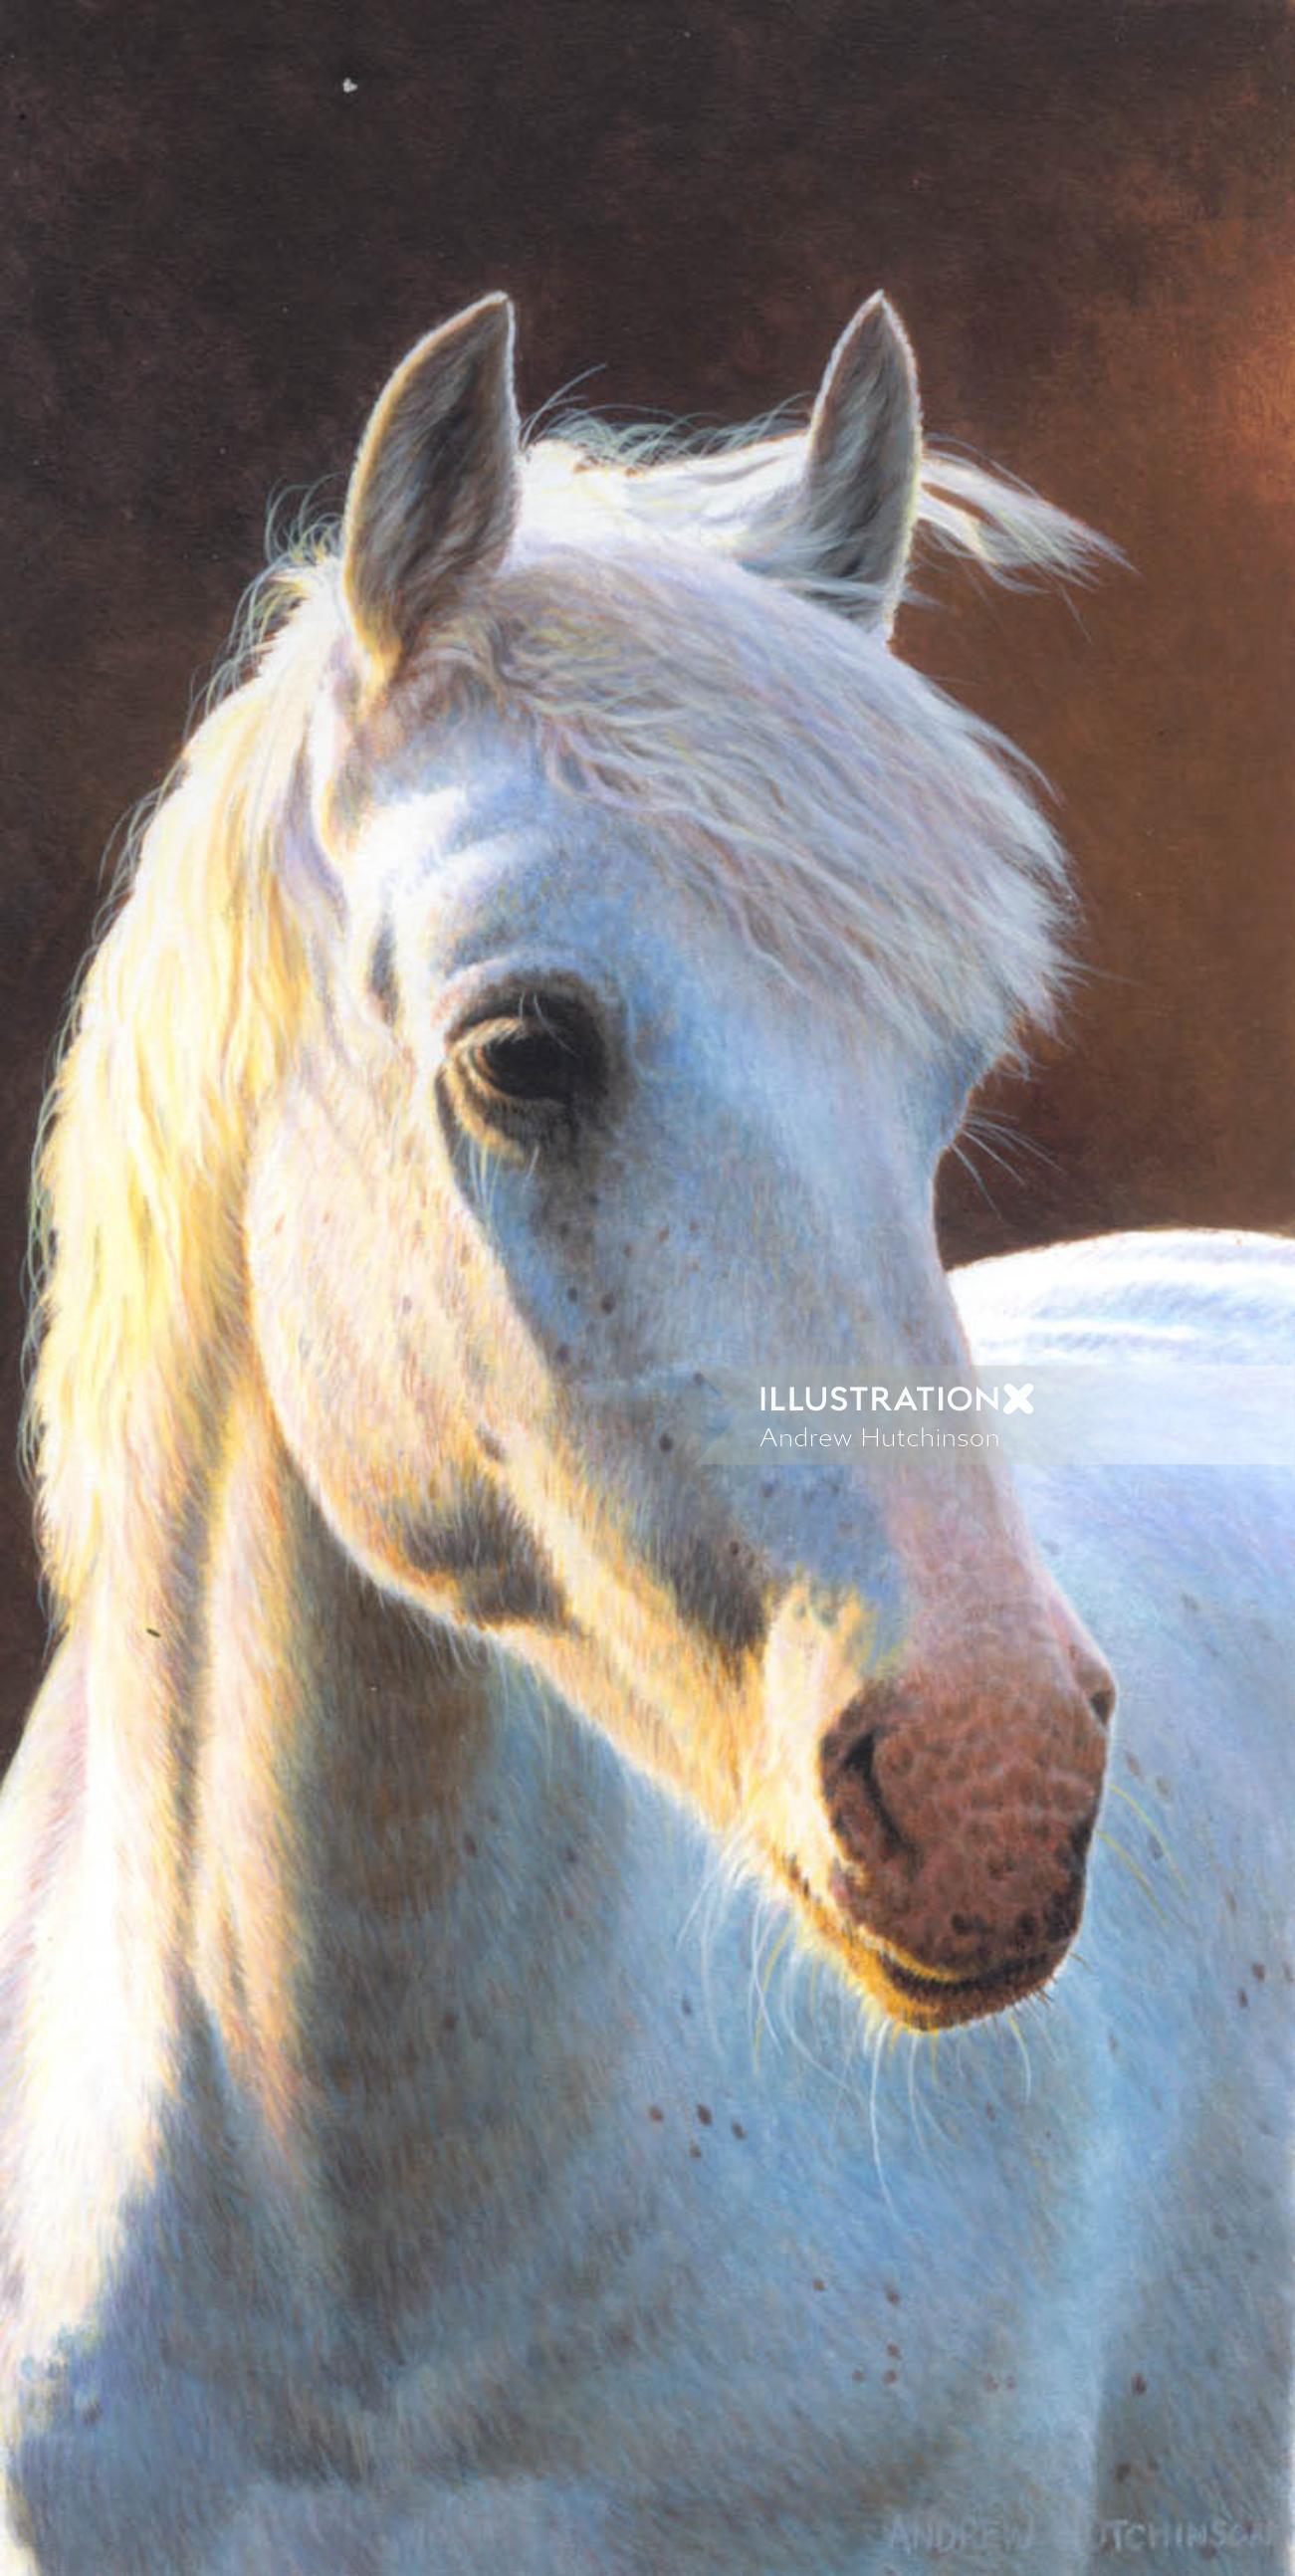 Horse Illustration, Farm Animals Images © Andrew Hutchinson